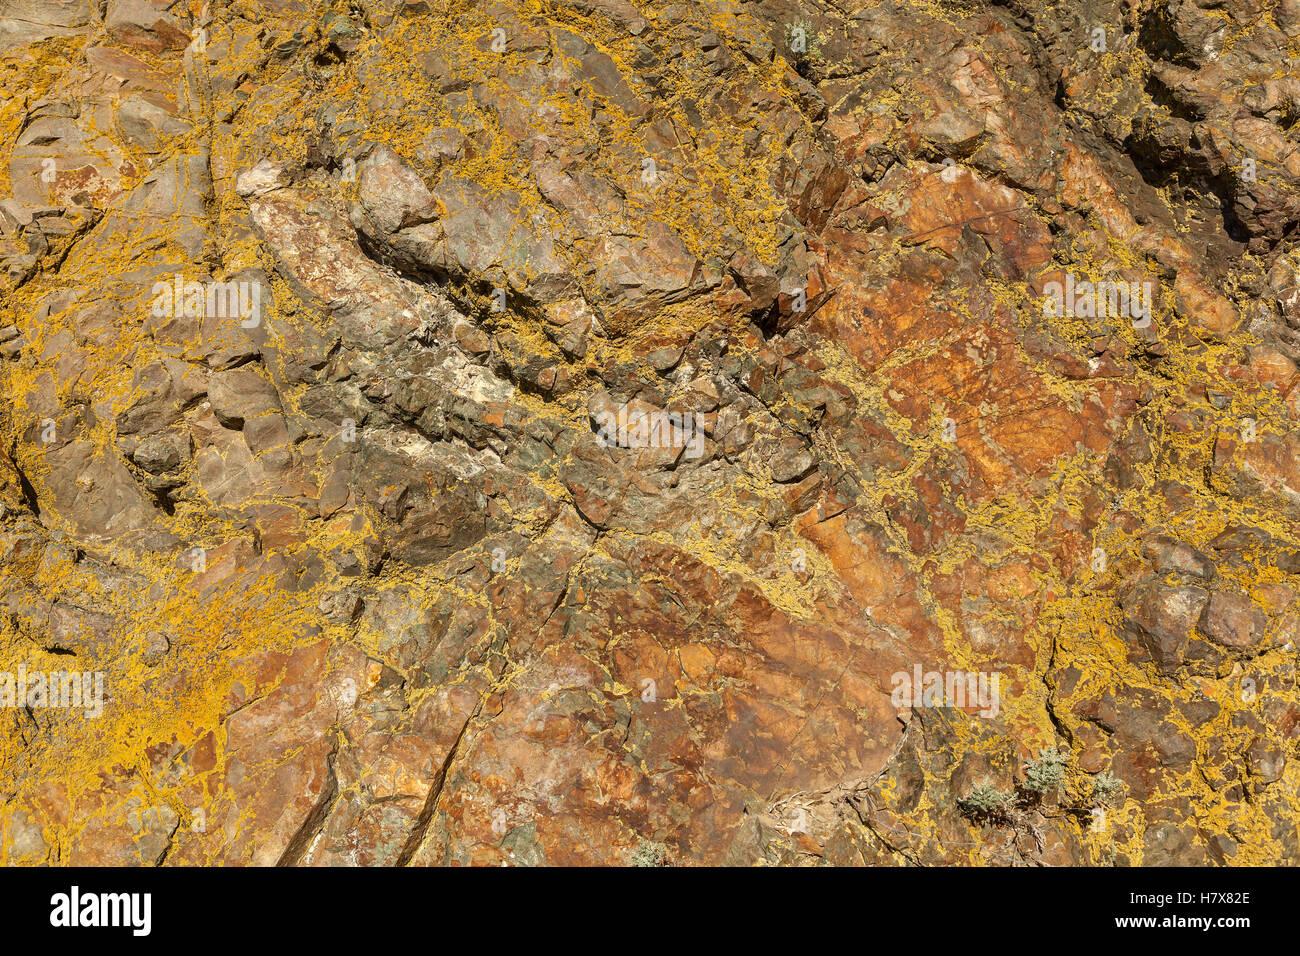 Superficie de mármol.close-up de textura de piedra de la escultura de mármol natural. Foto de stock